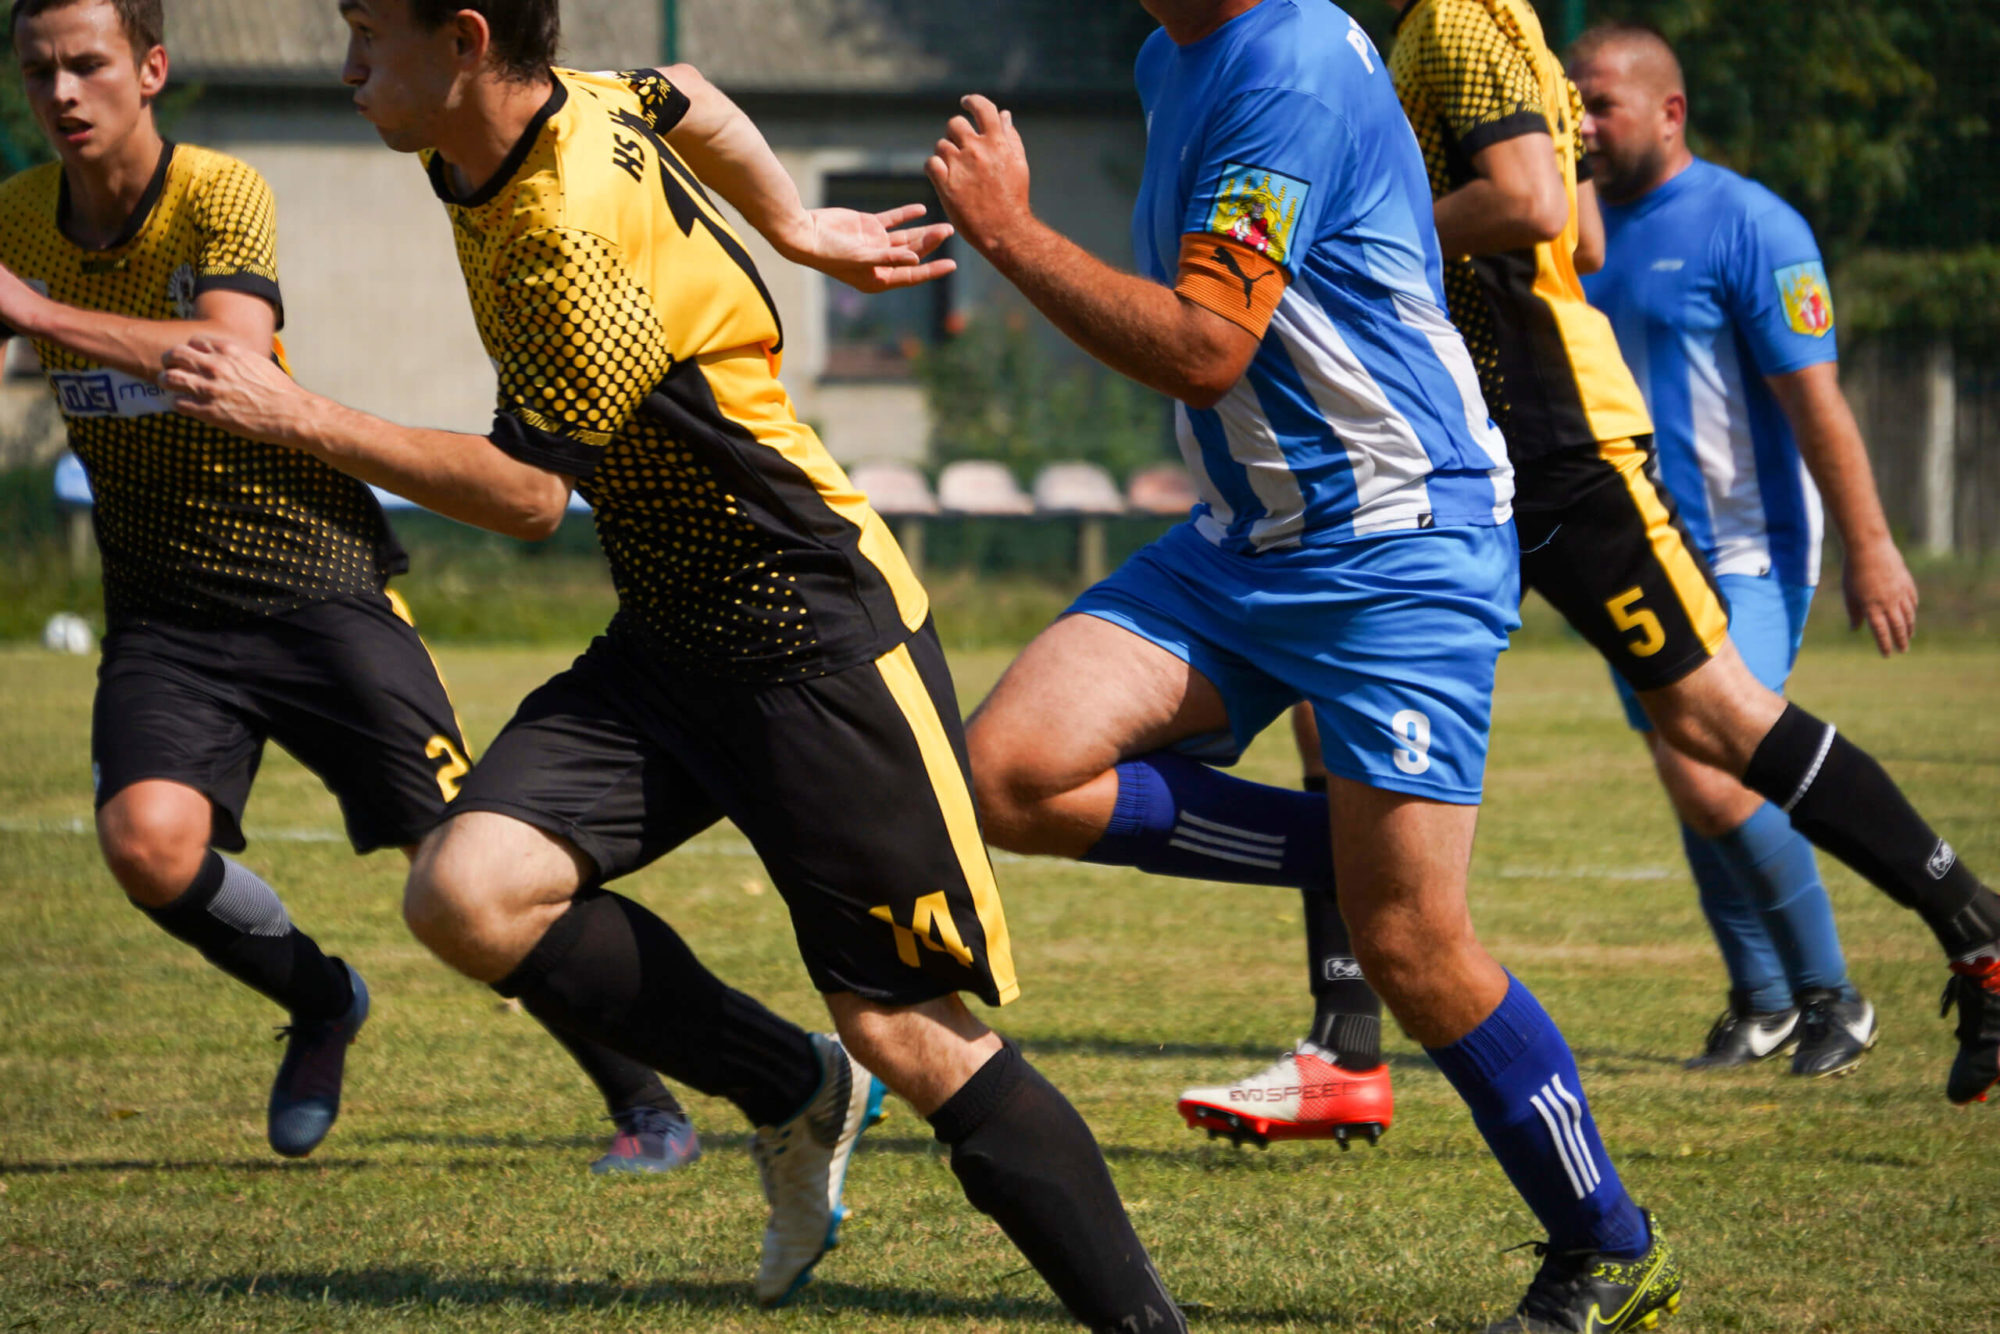 Stroje piłkarskie z nadrukami